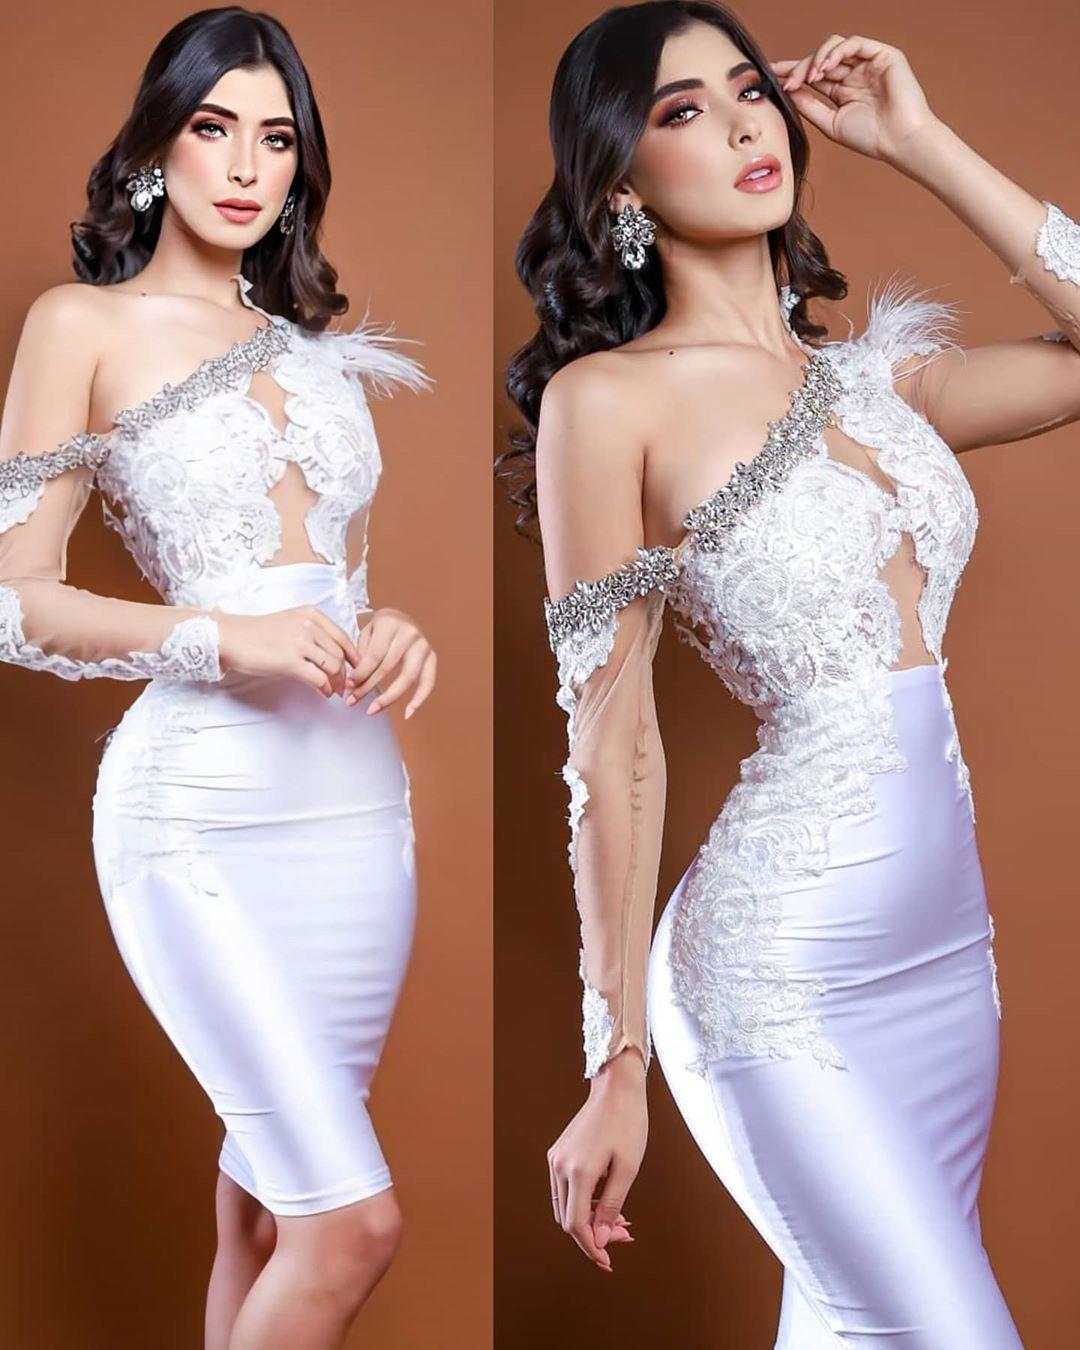 angela leon yuriar, miss grand mexico 2020. - Página 4 10729110